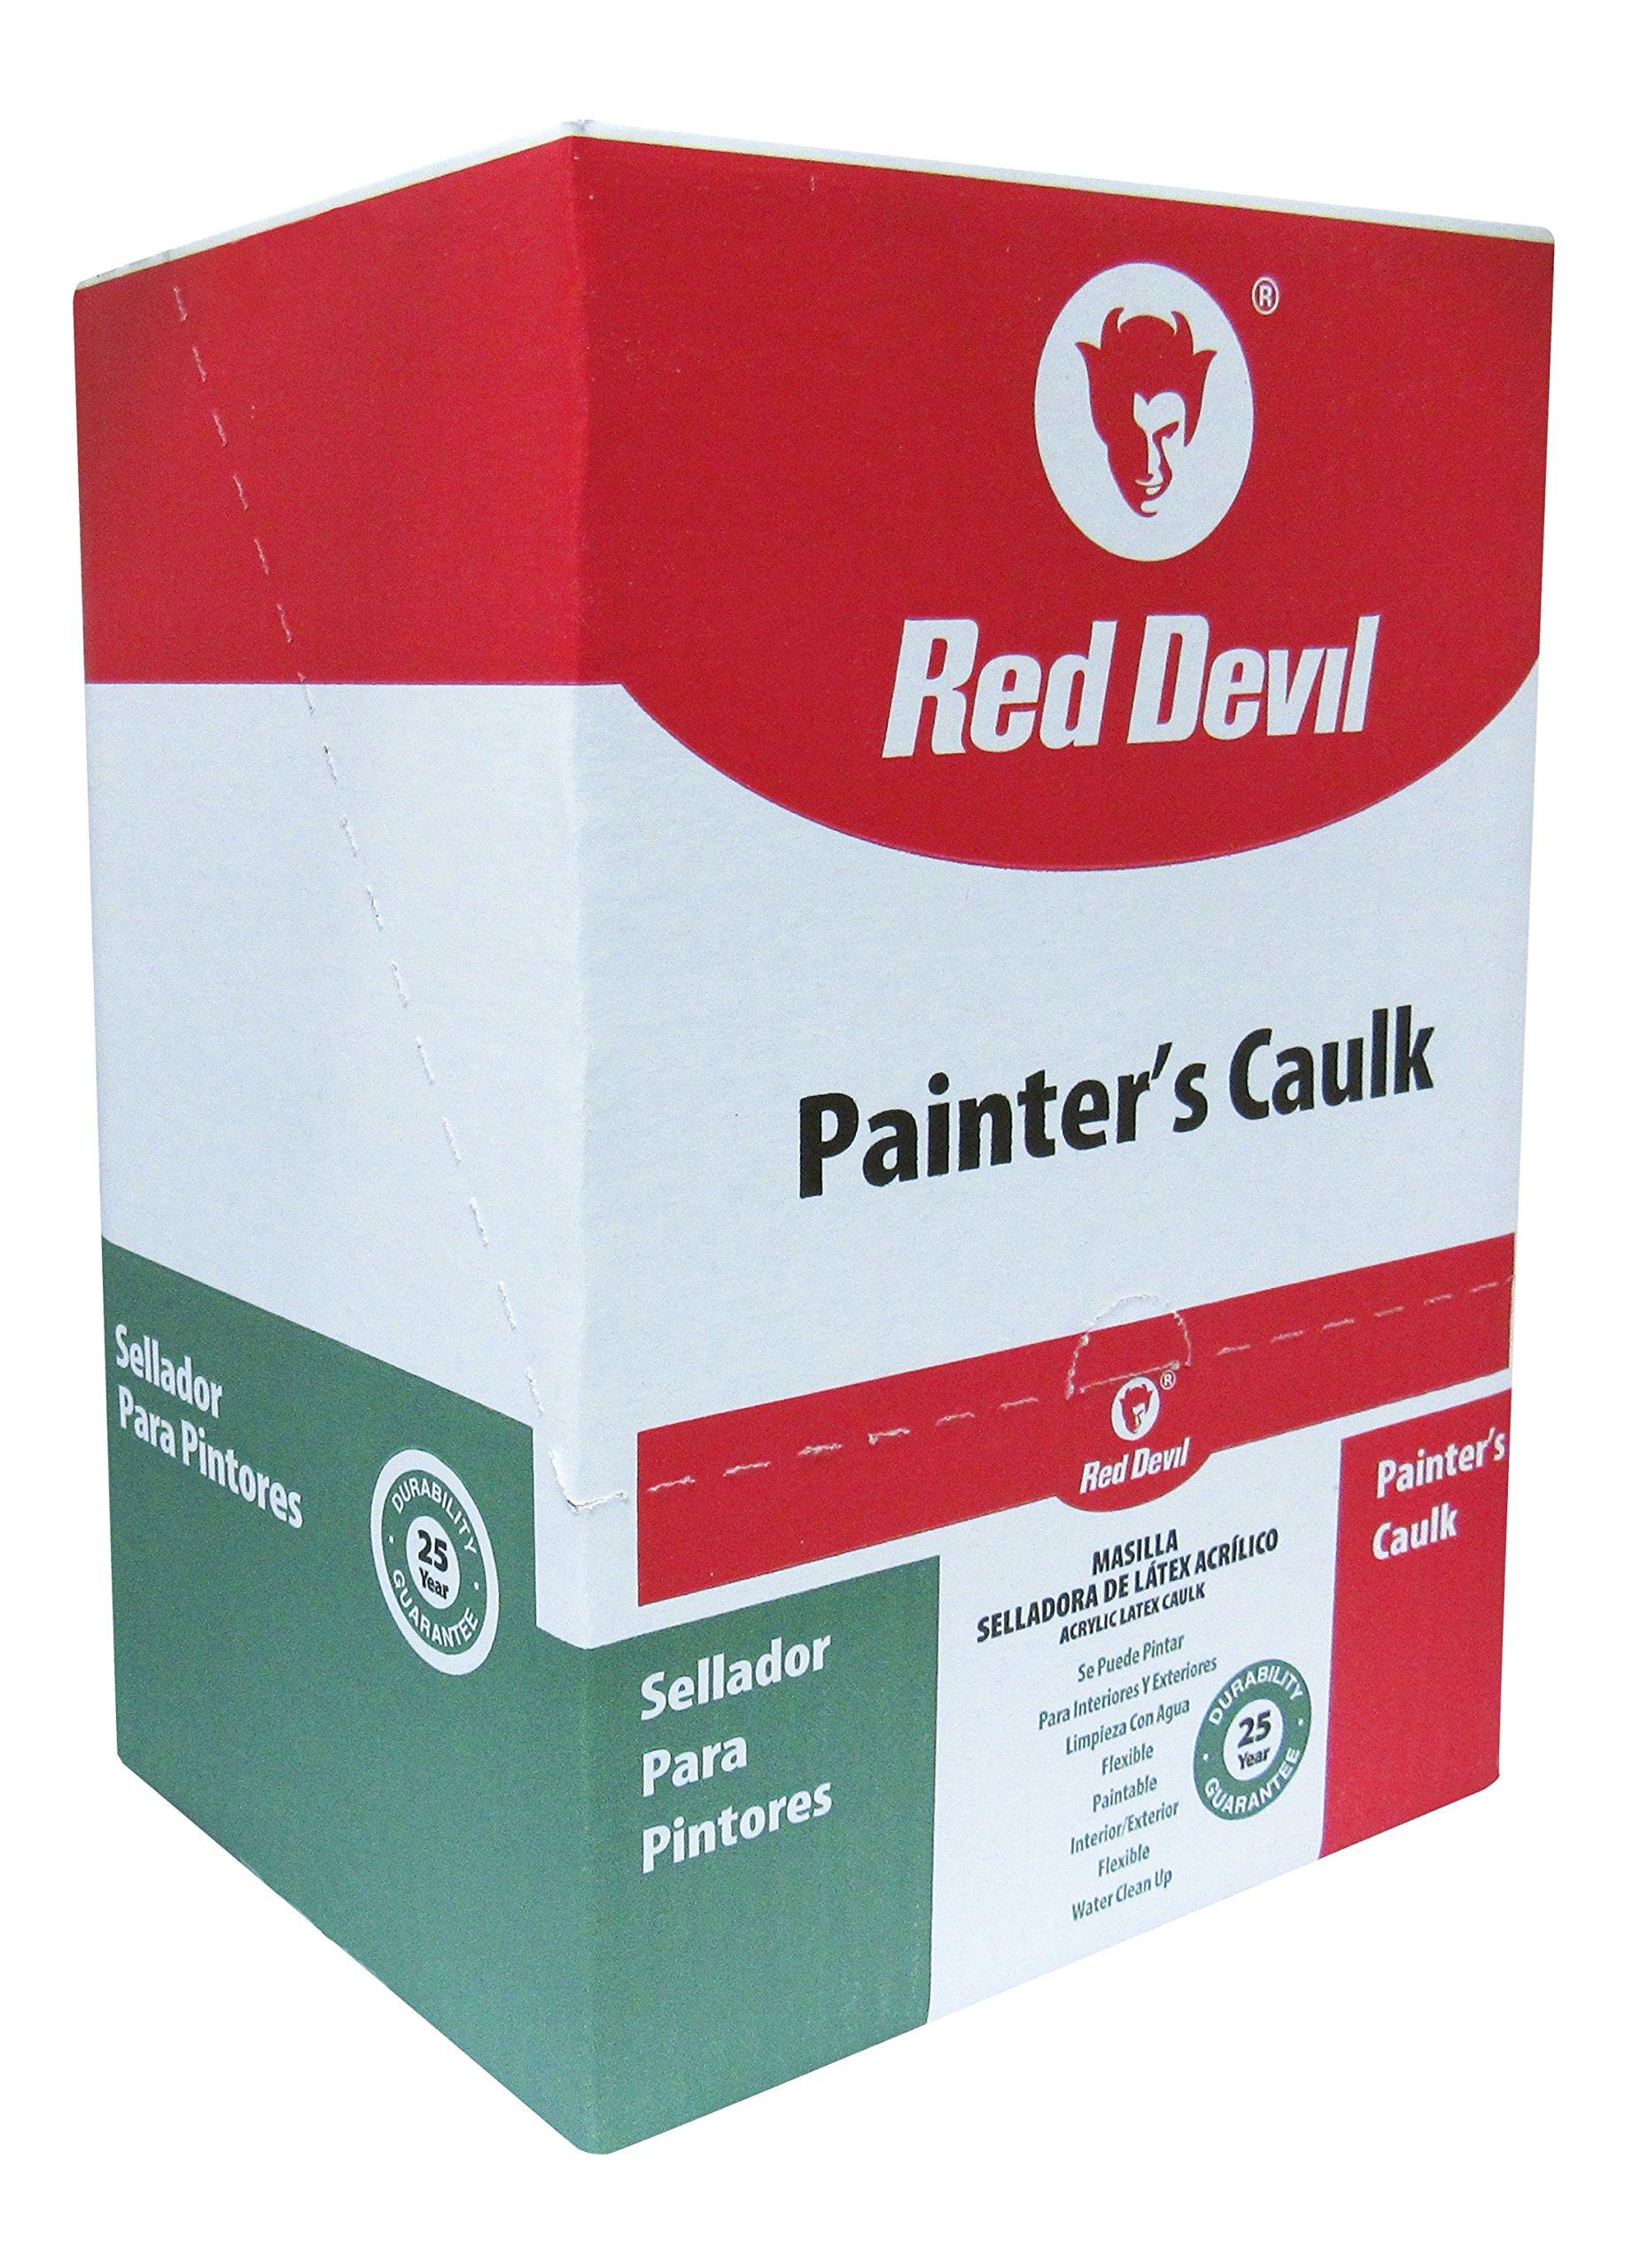 Red Devil Painters Caulk White, 10.1 Oz, Case of 12